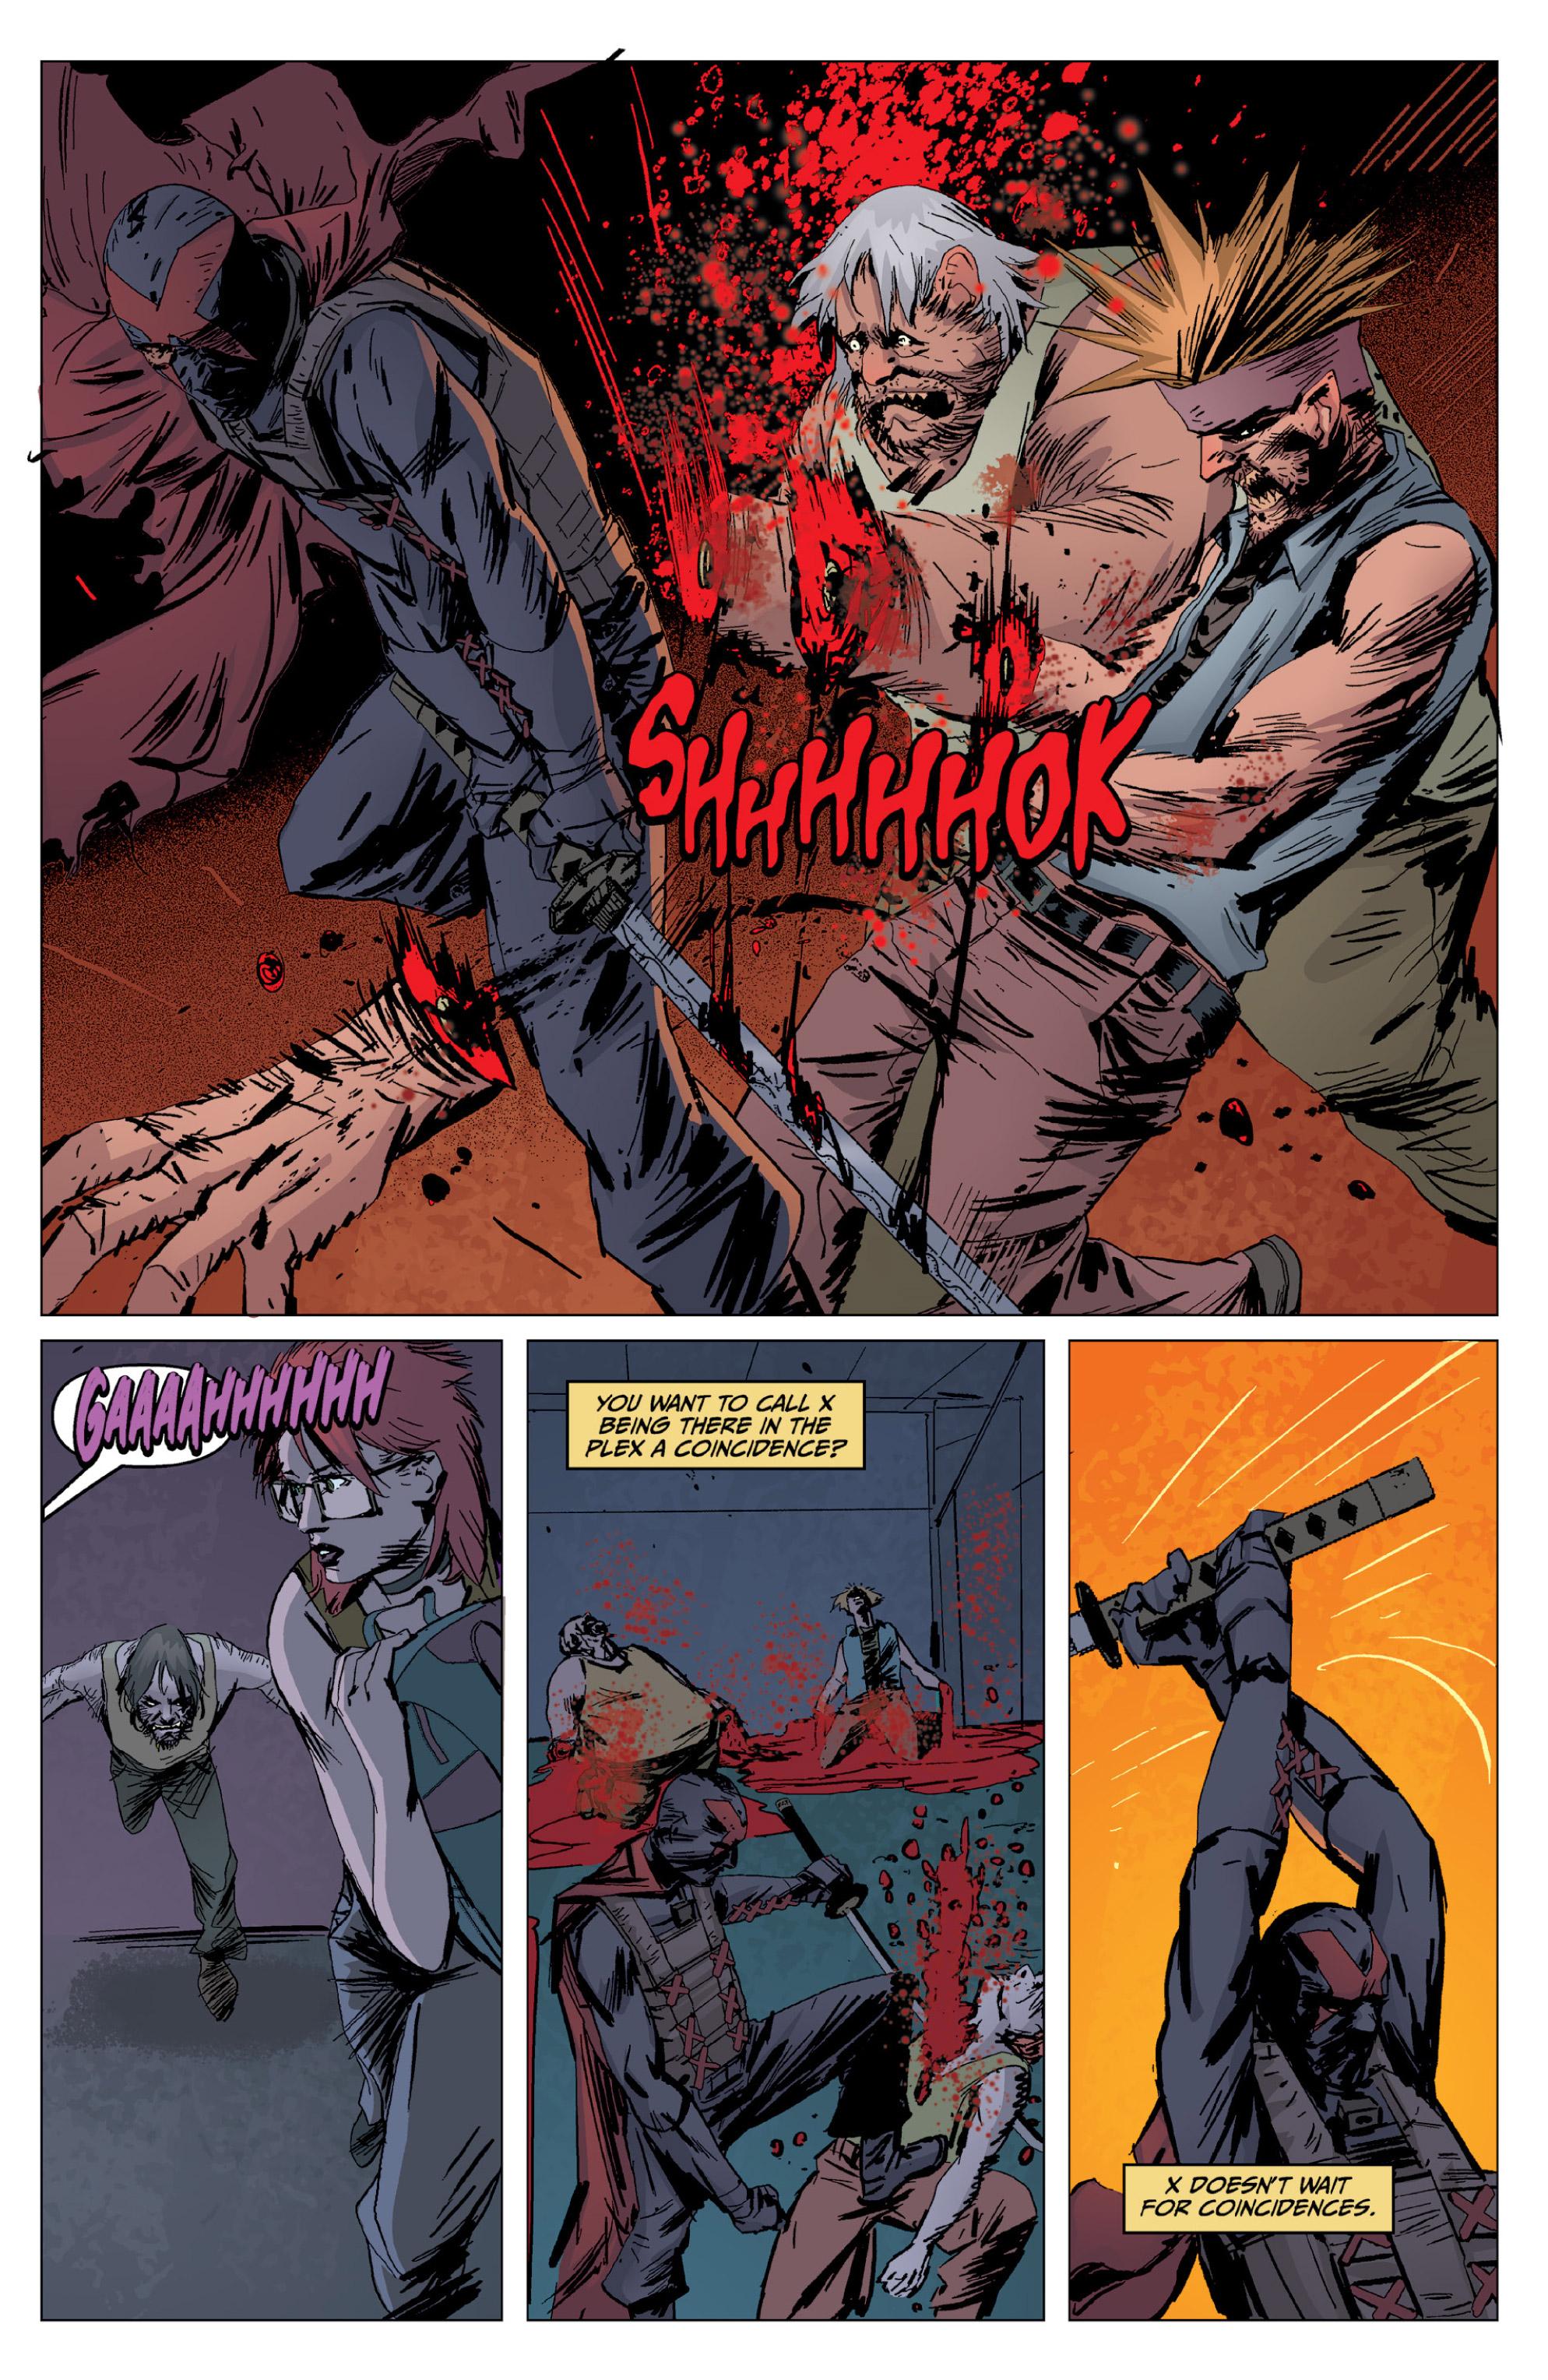 Read online X: Big Bad comic -  Issue # Full - 90